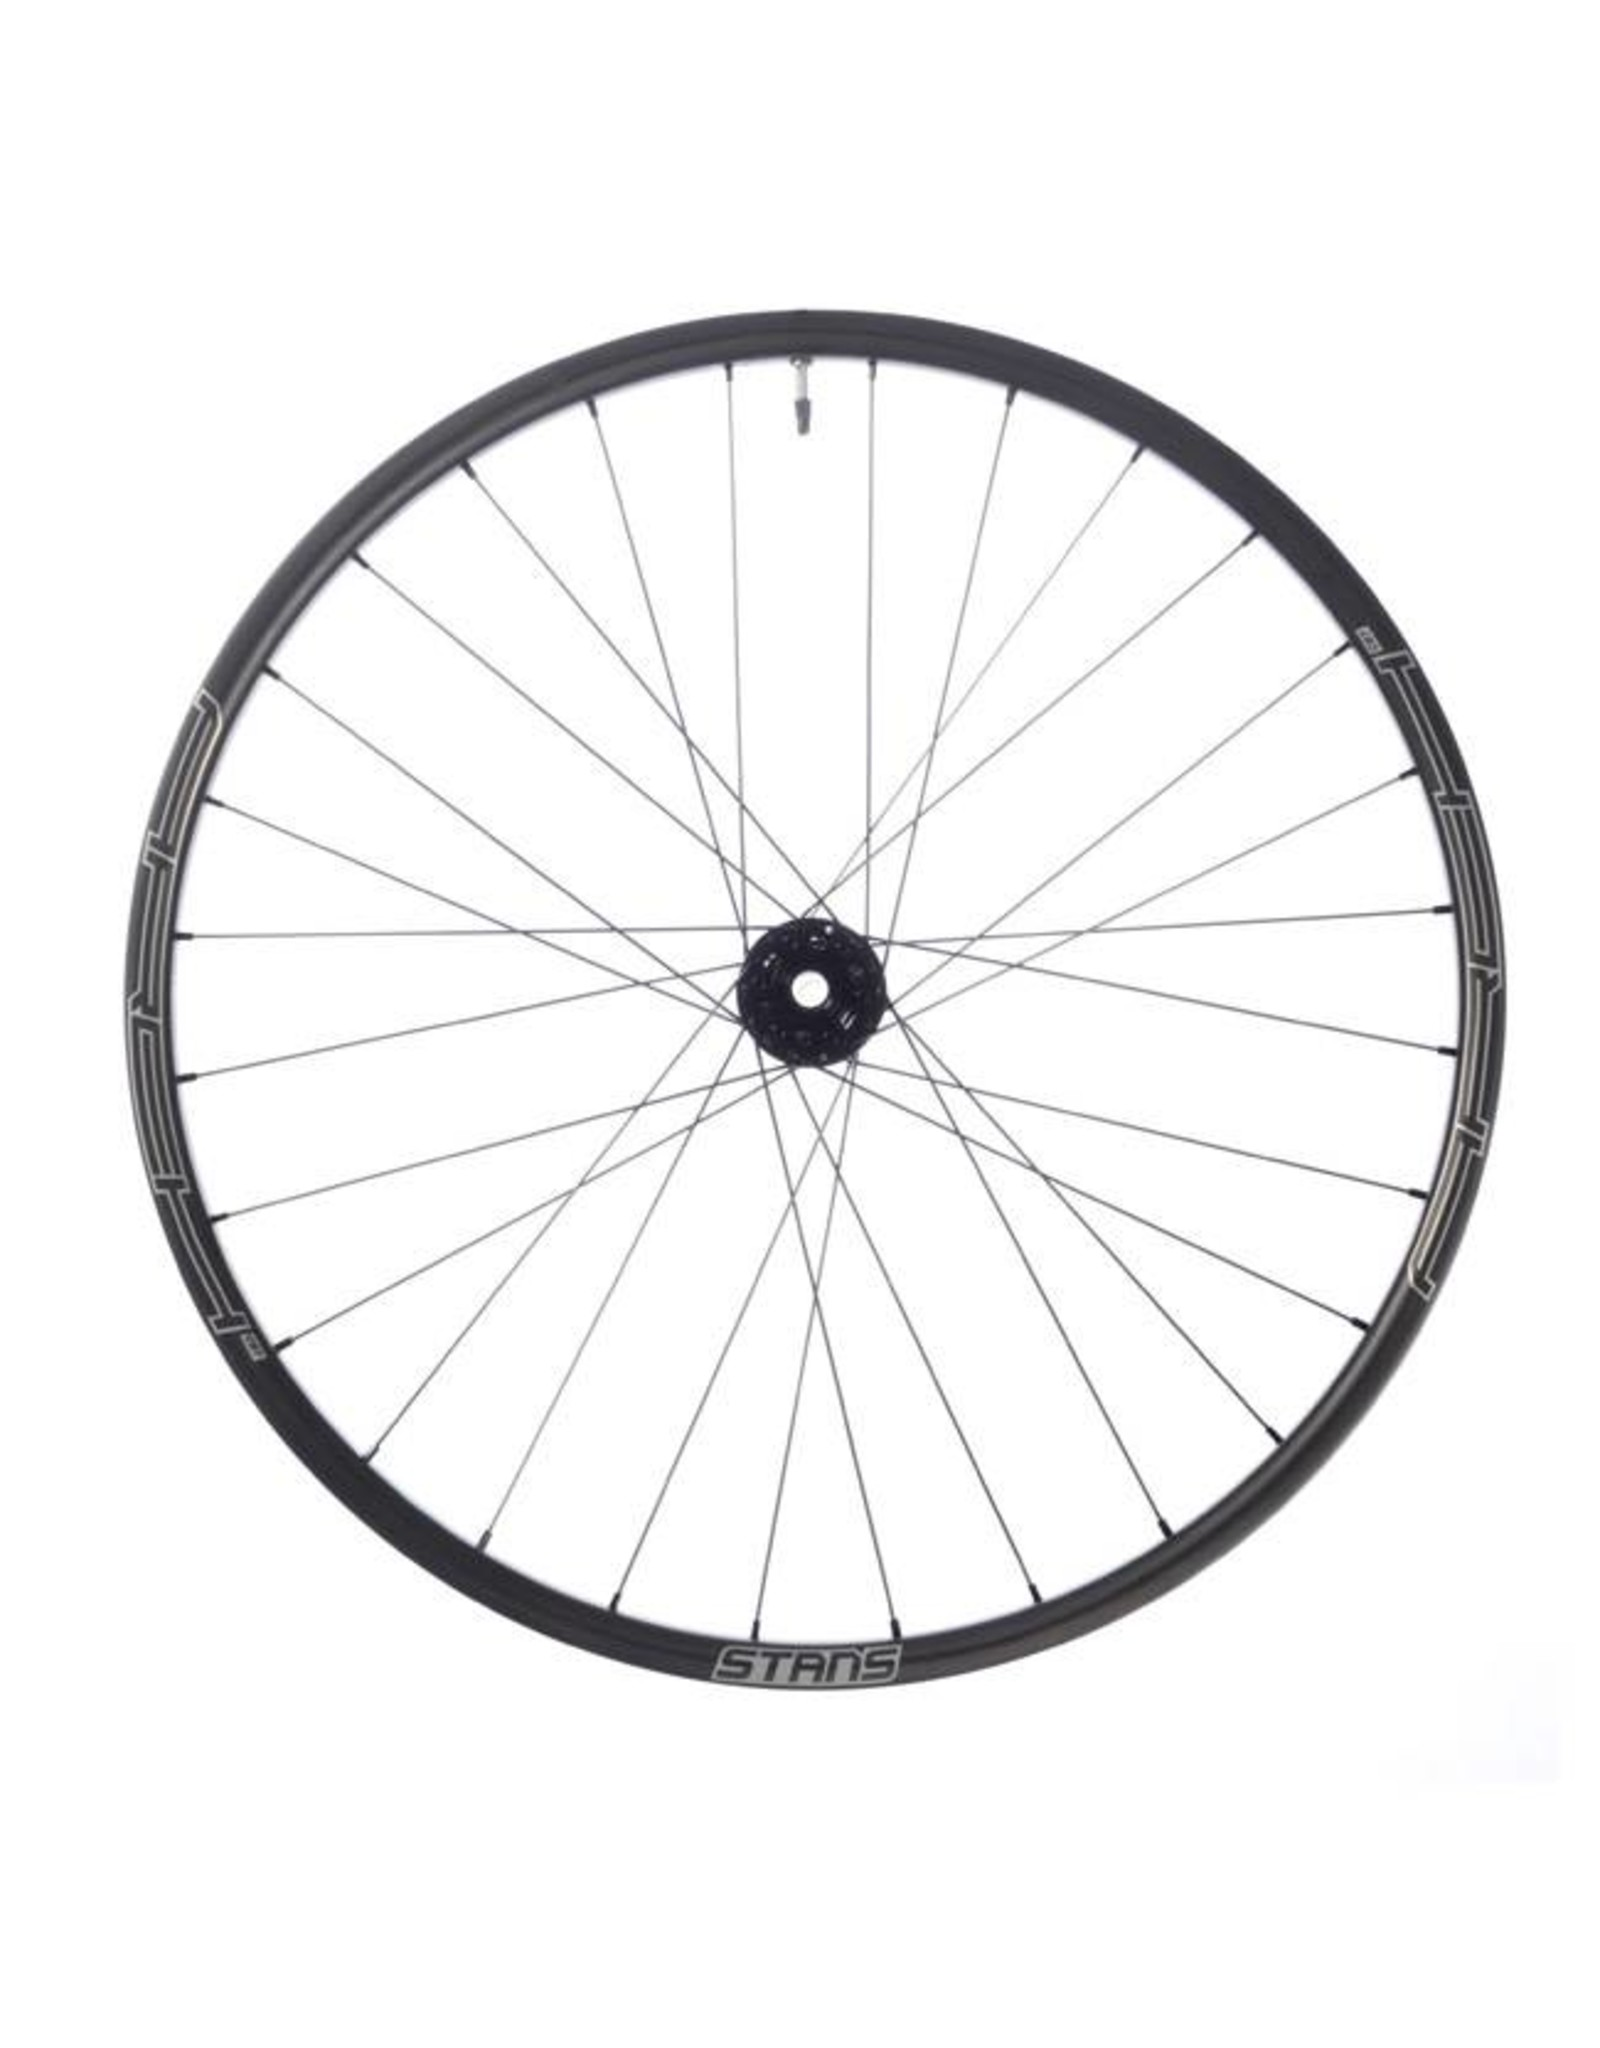 "Stan's No Tubes Stan's No Tubes Arch CB7 Rear Wheel: 29"" Carbon, 12 x 142mm, 6-Bolt Disc, SRAM XD, Black"